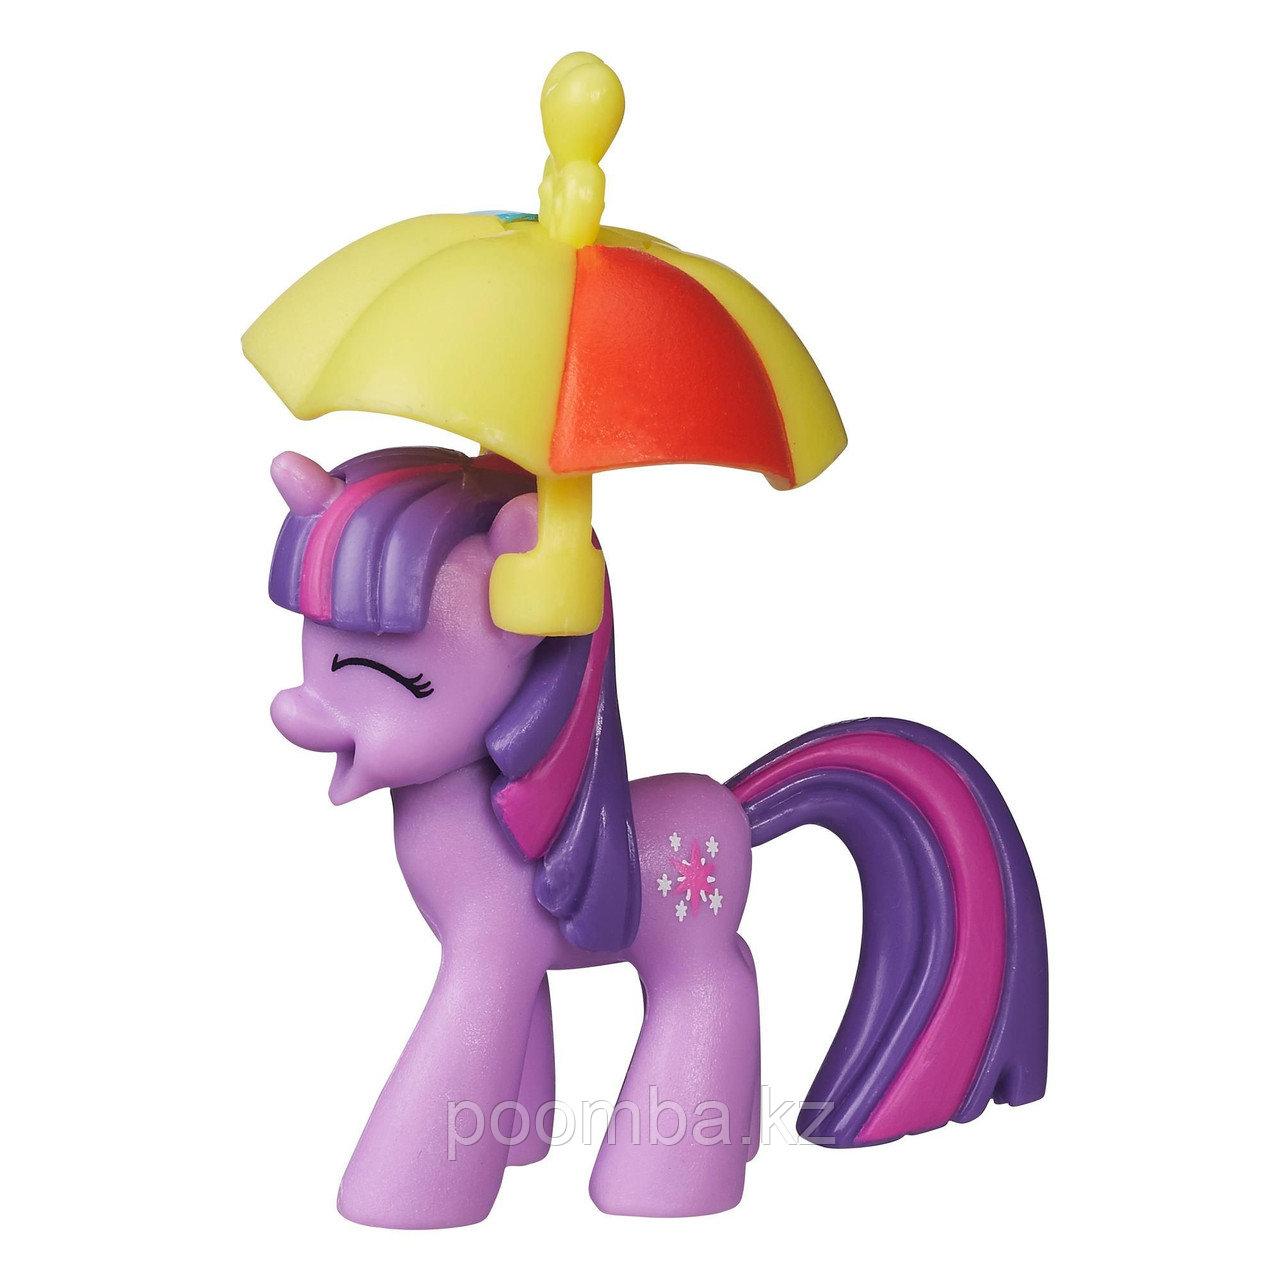 Коллекционная фигурка My Little Pony - Twilight Sparkle, 2 волна